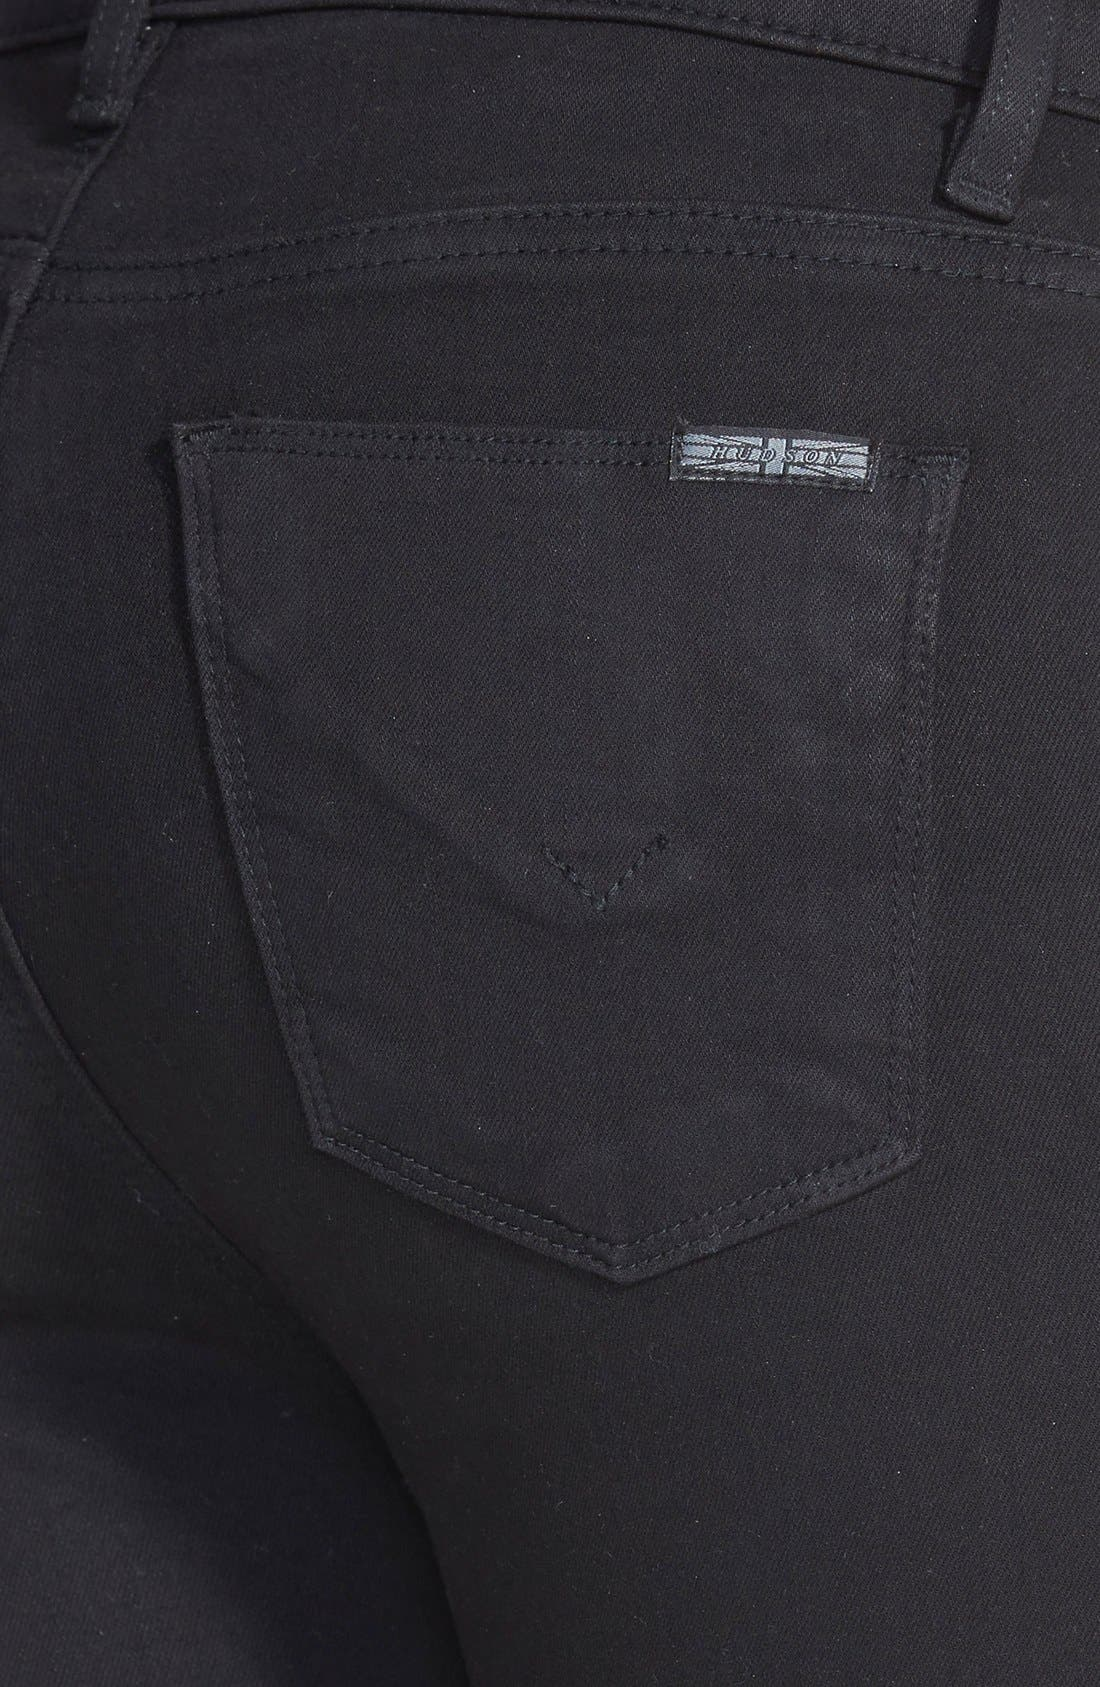 Barbara High Waist Skinny Jeans,                             Alternate thumbnail 4, color,                             001